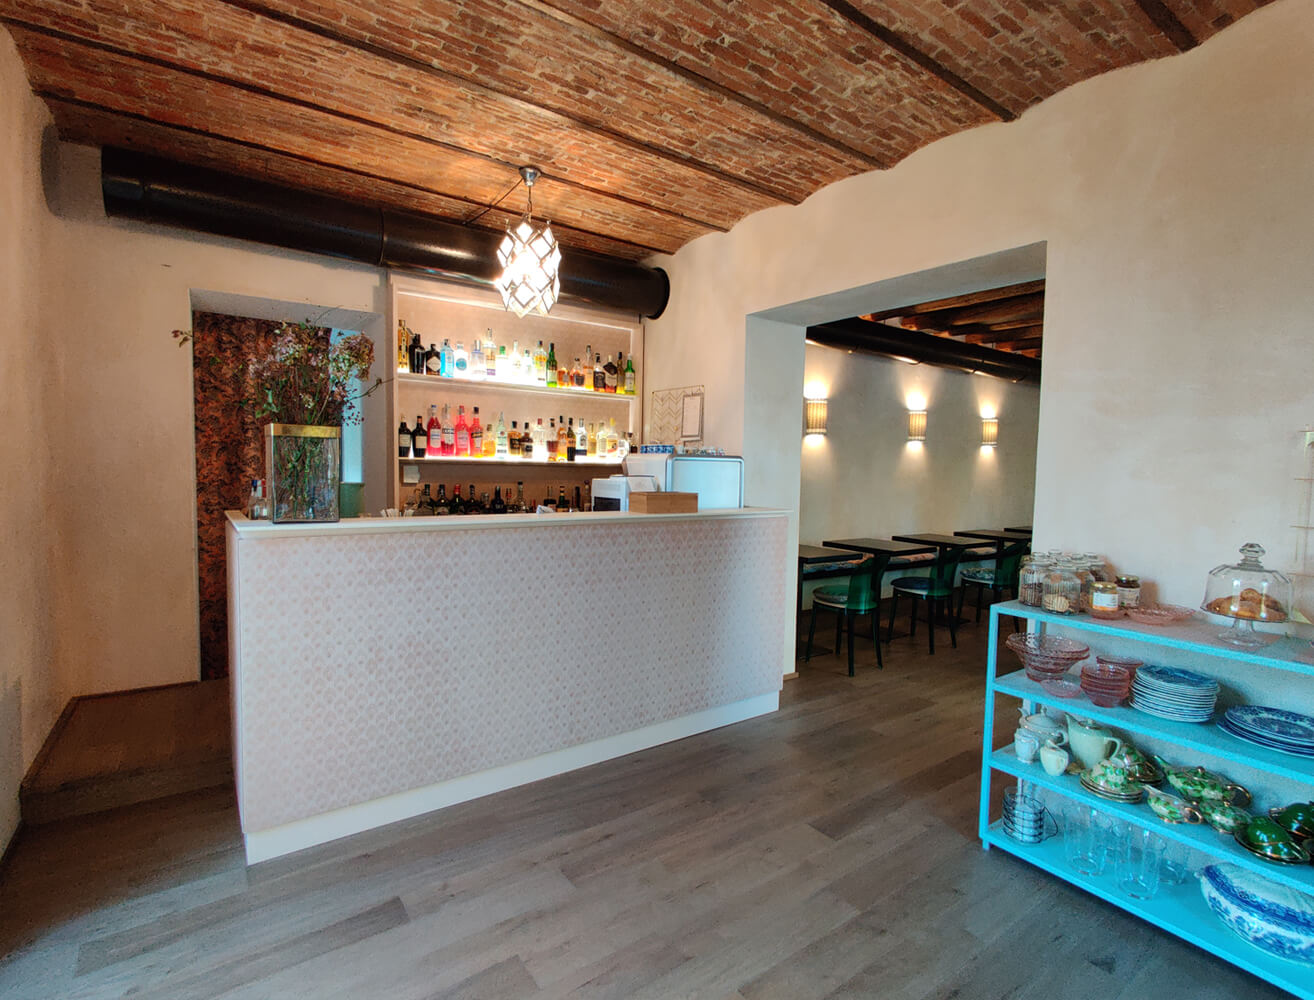 Dandelion Cafe' - Photo 10